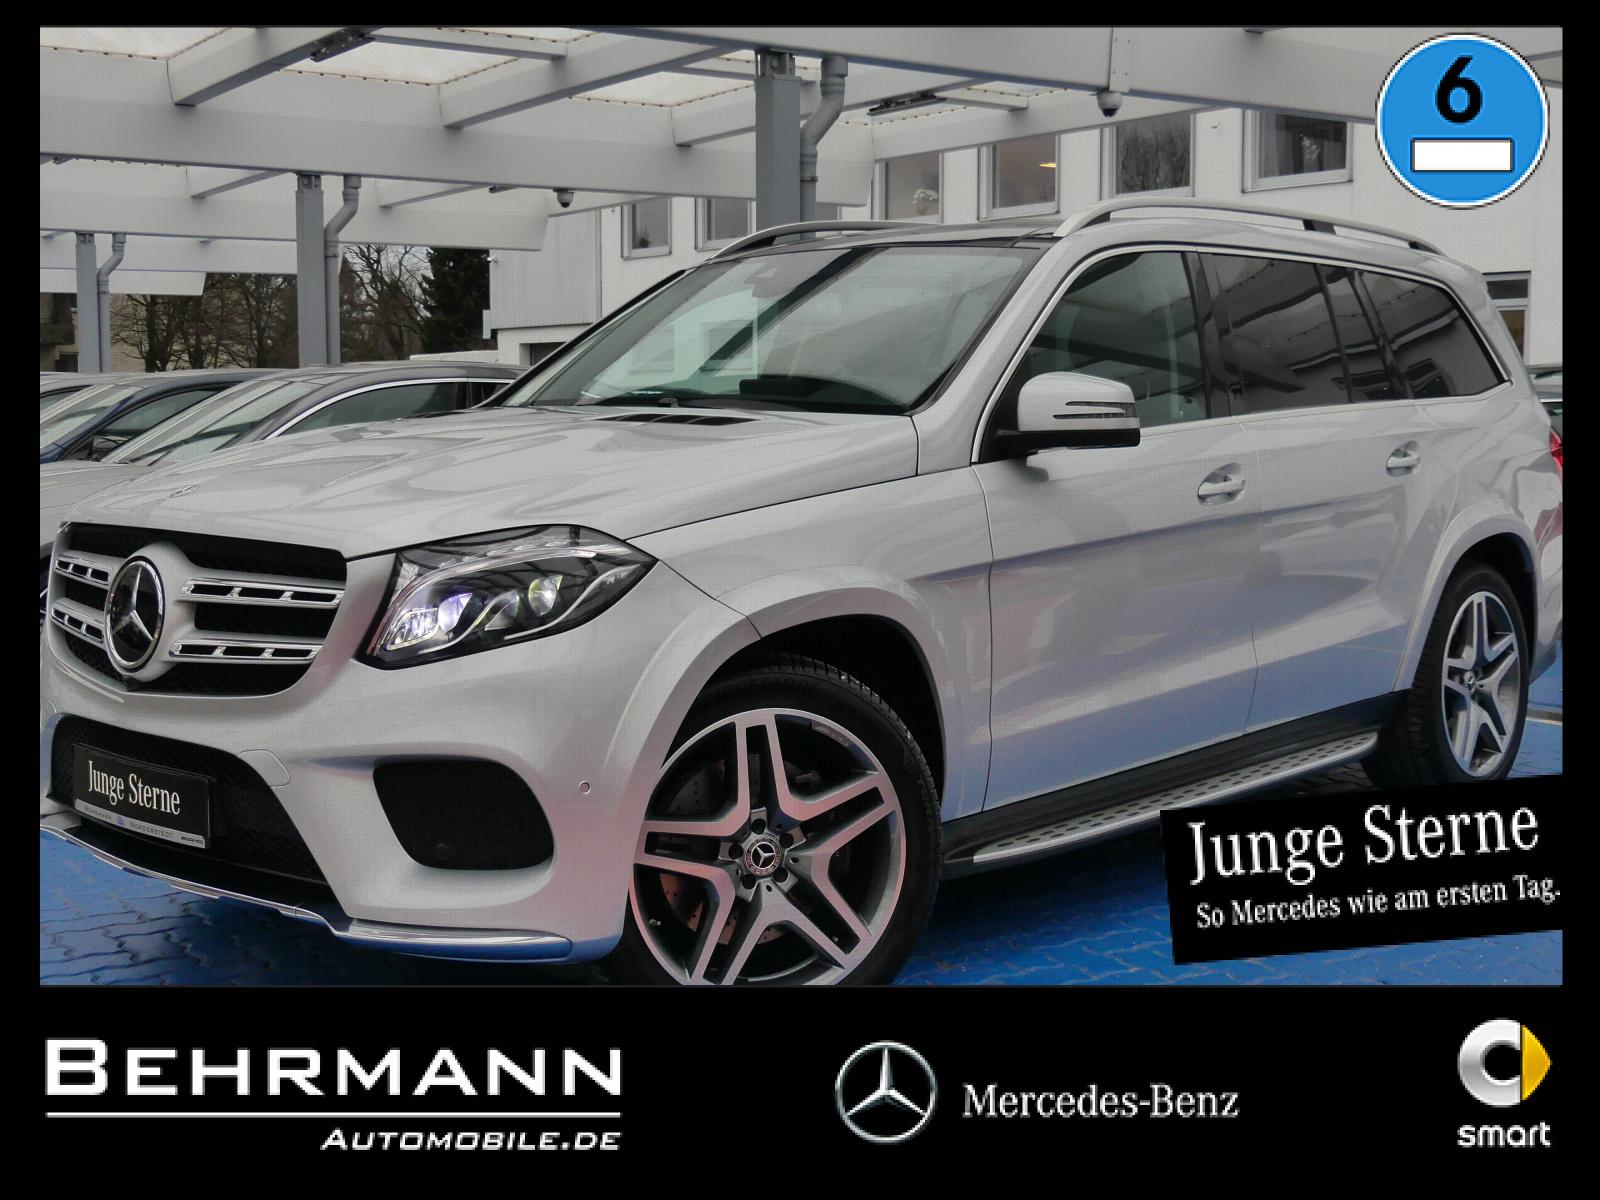 Mercedes-Benz GLS 350d AMG 4M +Distronic+360°Kam+AHK+Panorama+, Jahr 2019, Diesel